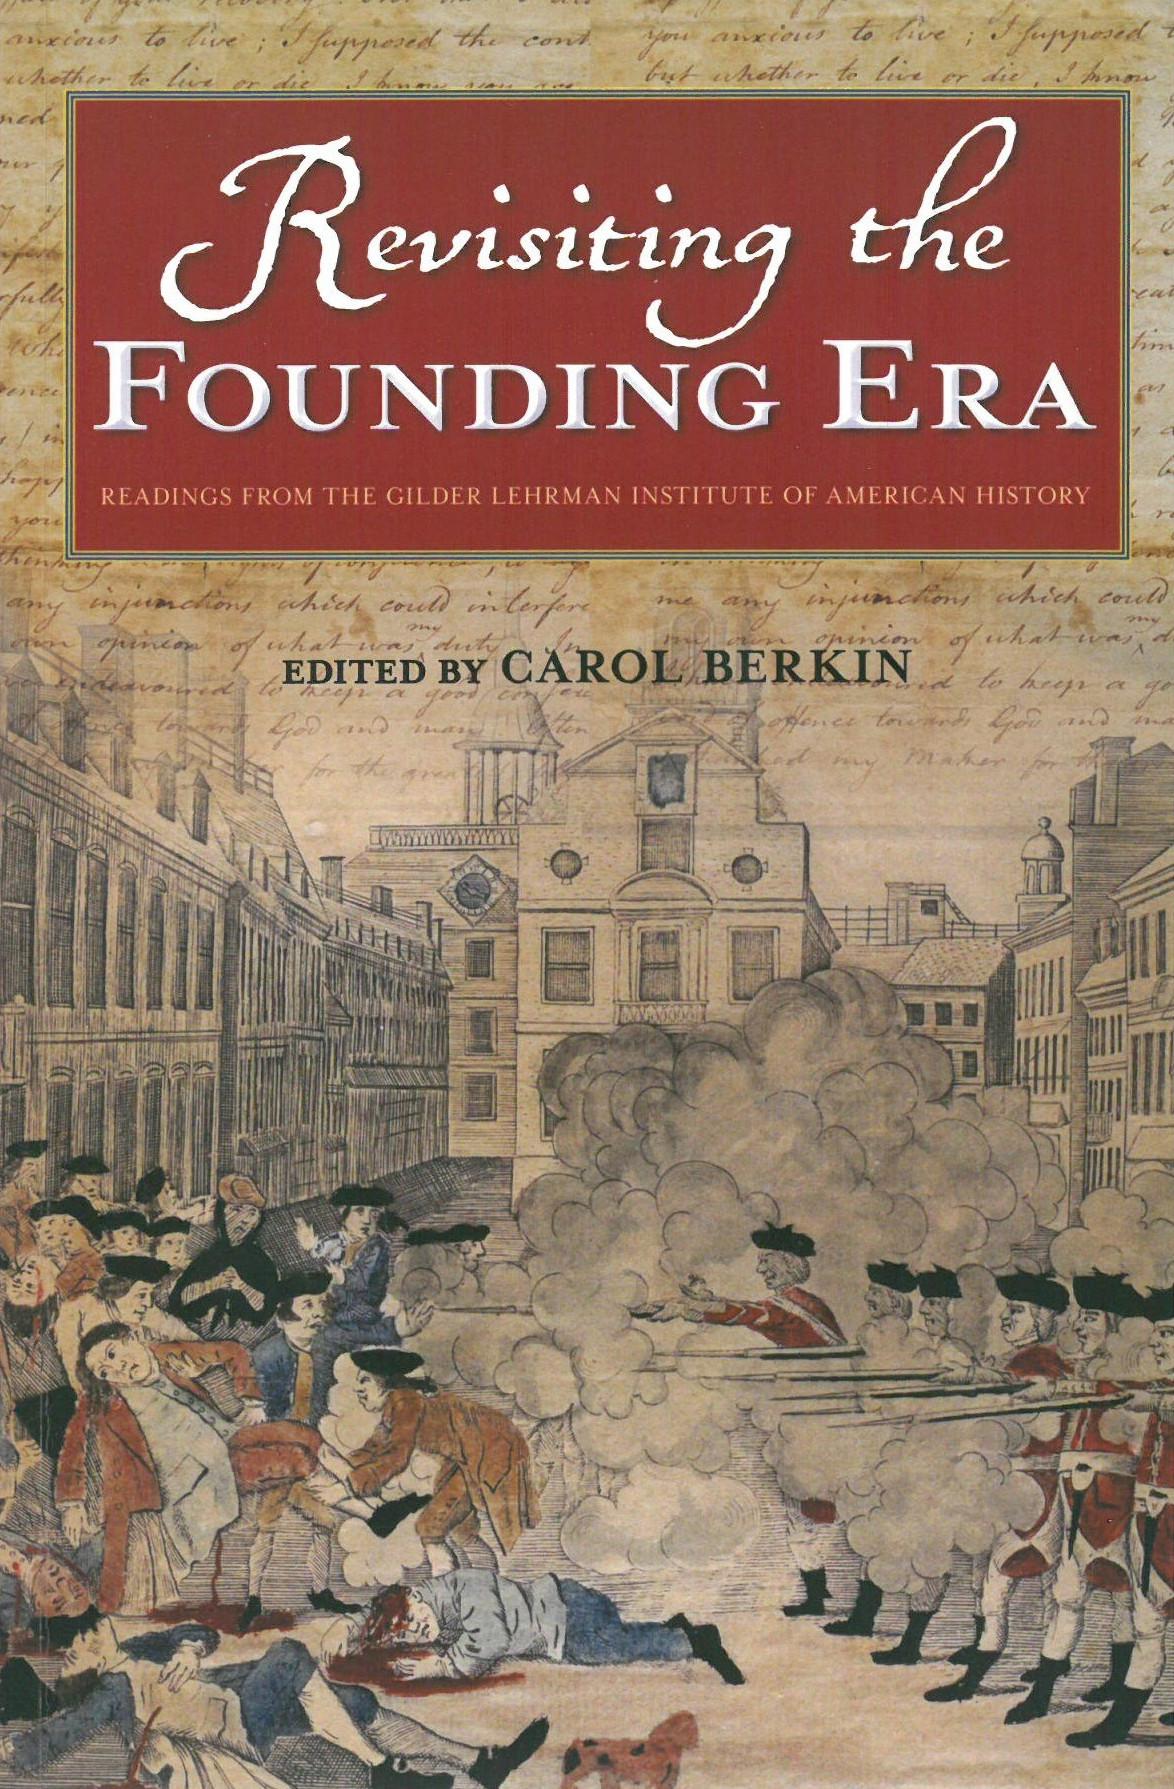 Revisiting the Founding Era Book Cover